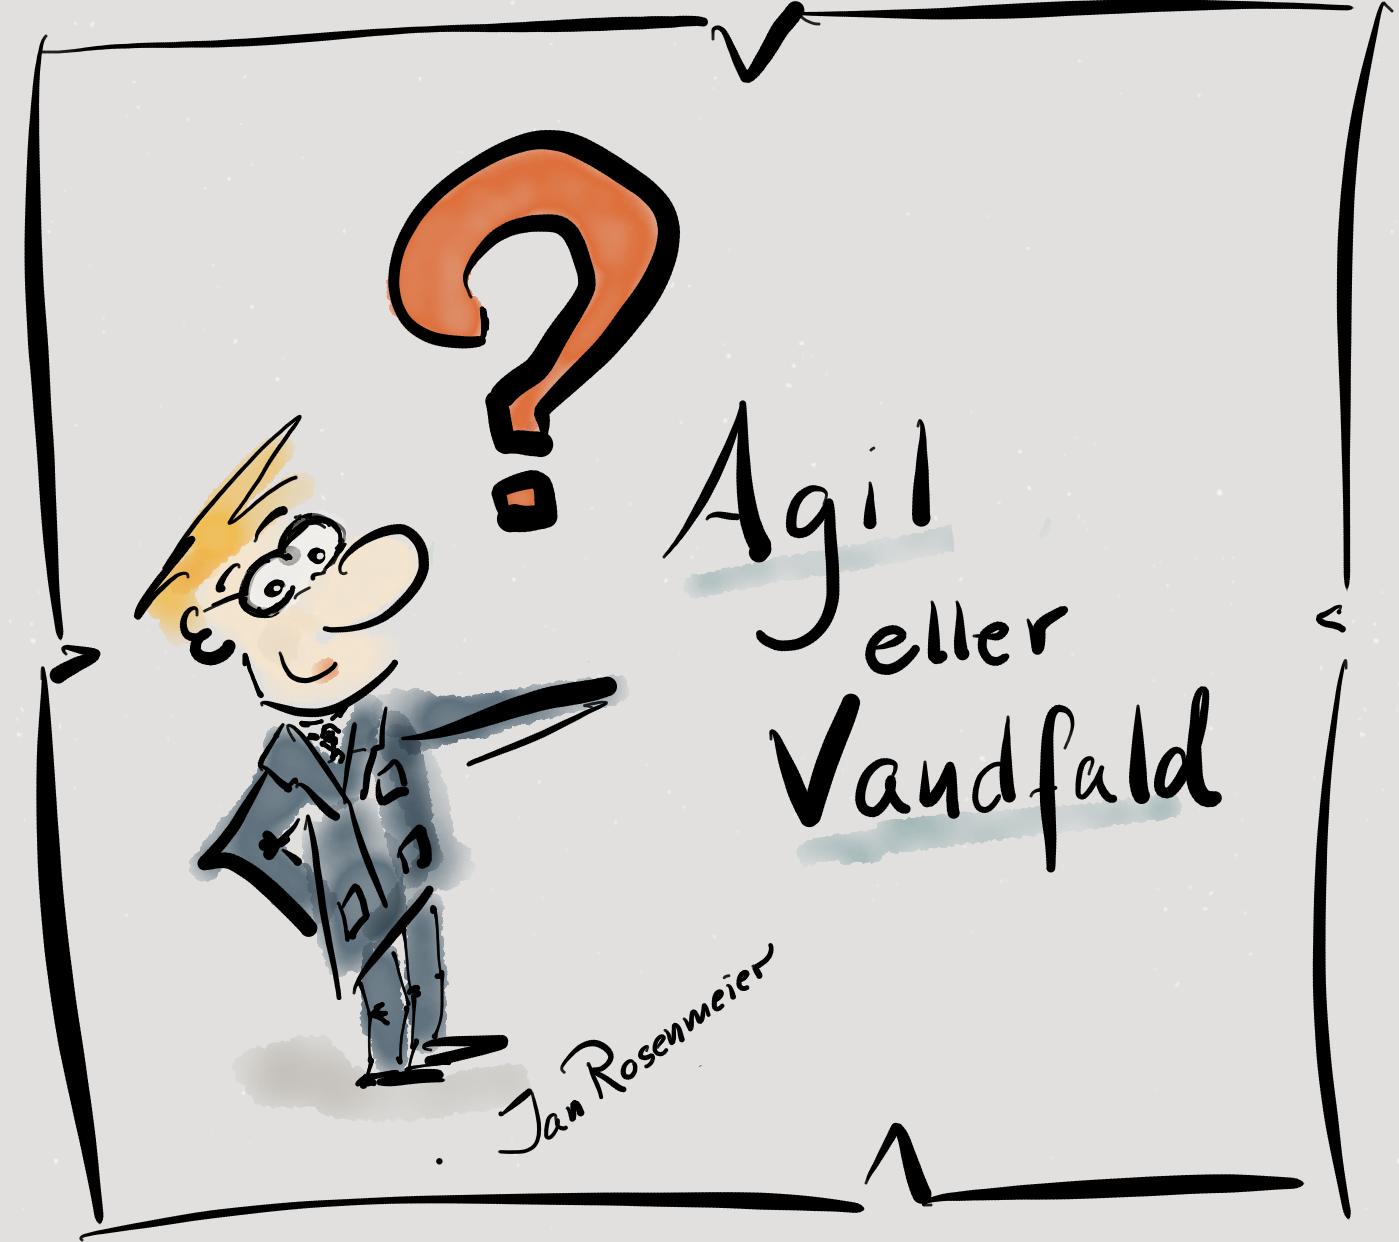 agil-eller-vandfald-illustration-ny